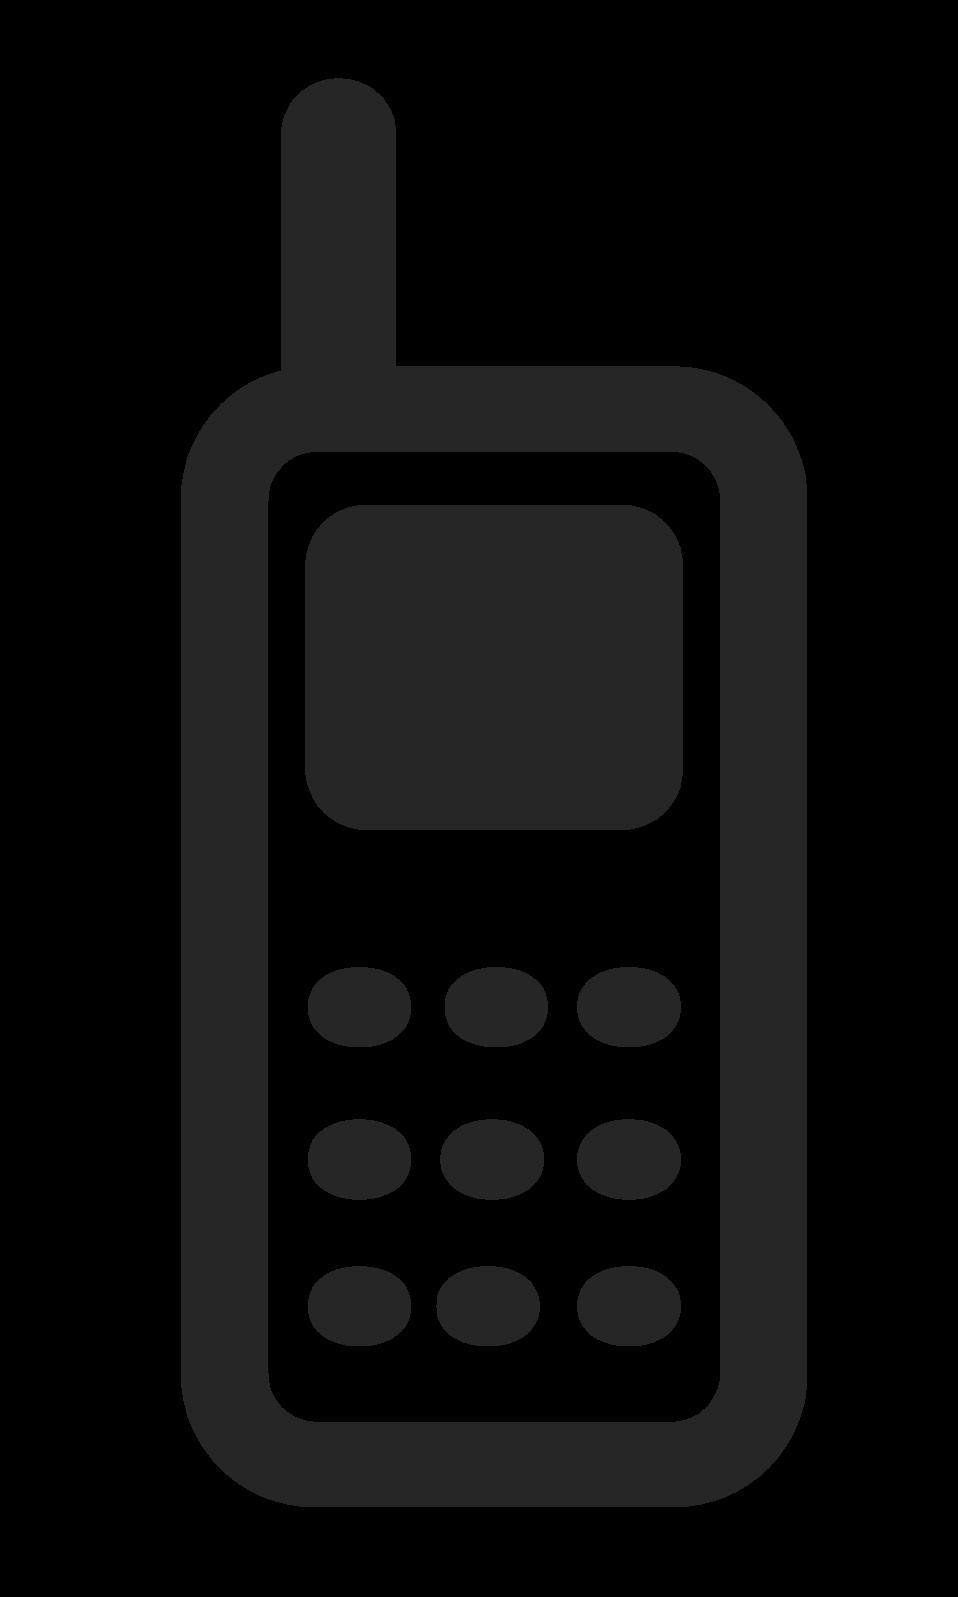 Clipart phone telephony. Public domain clip art